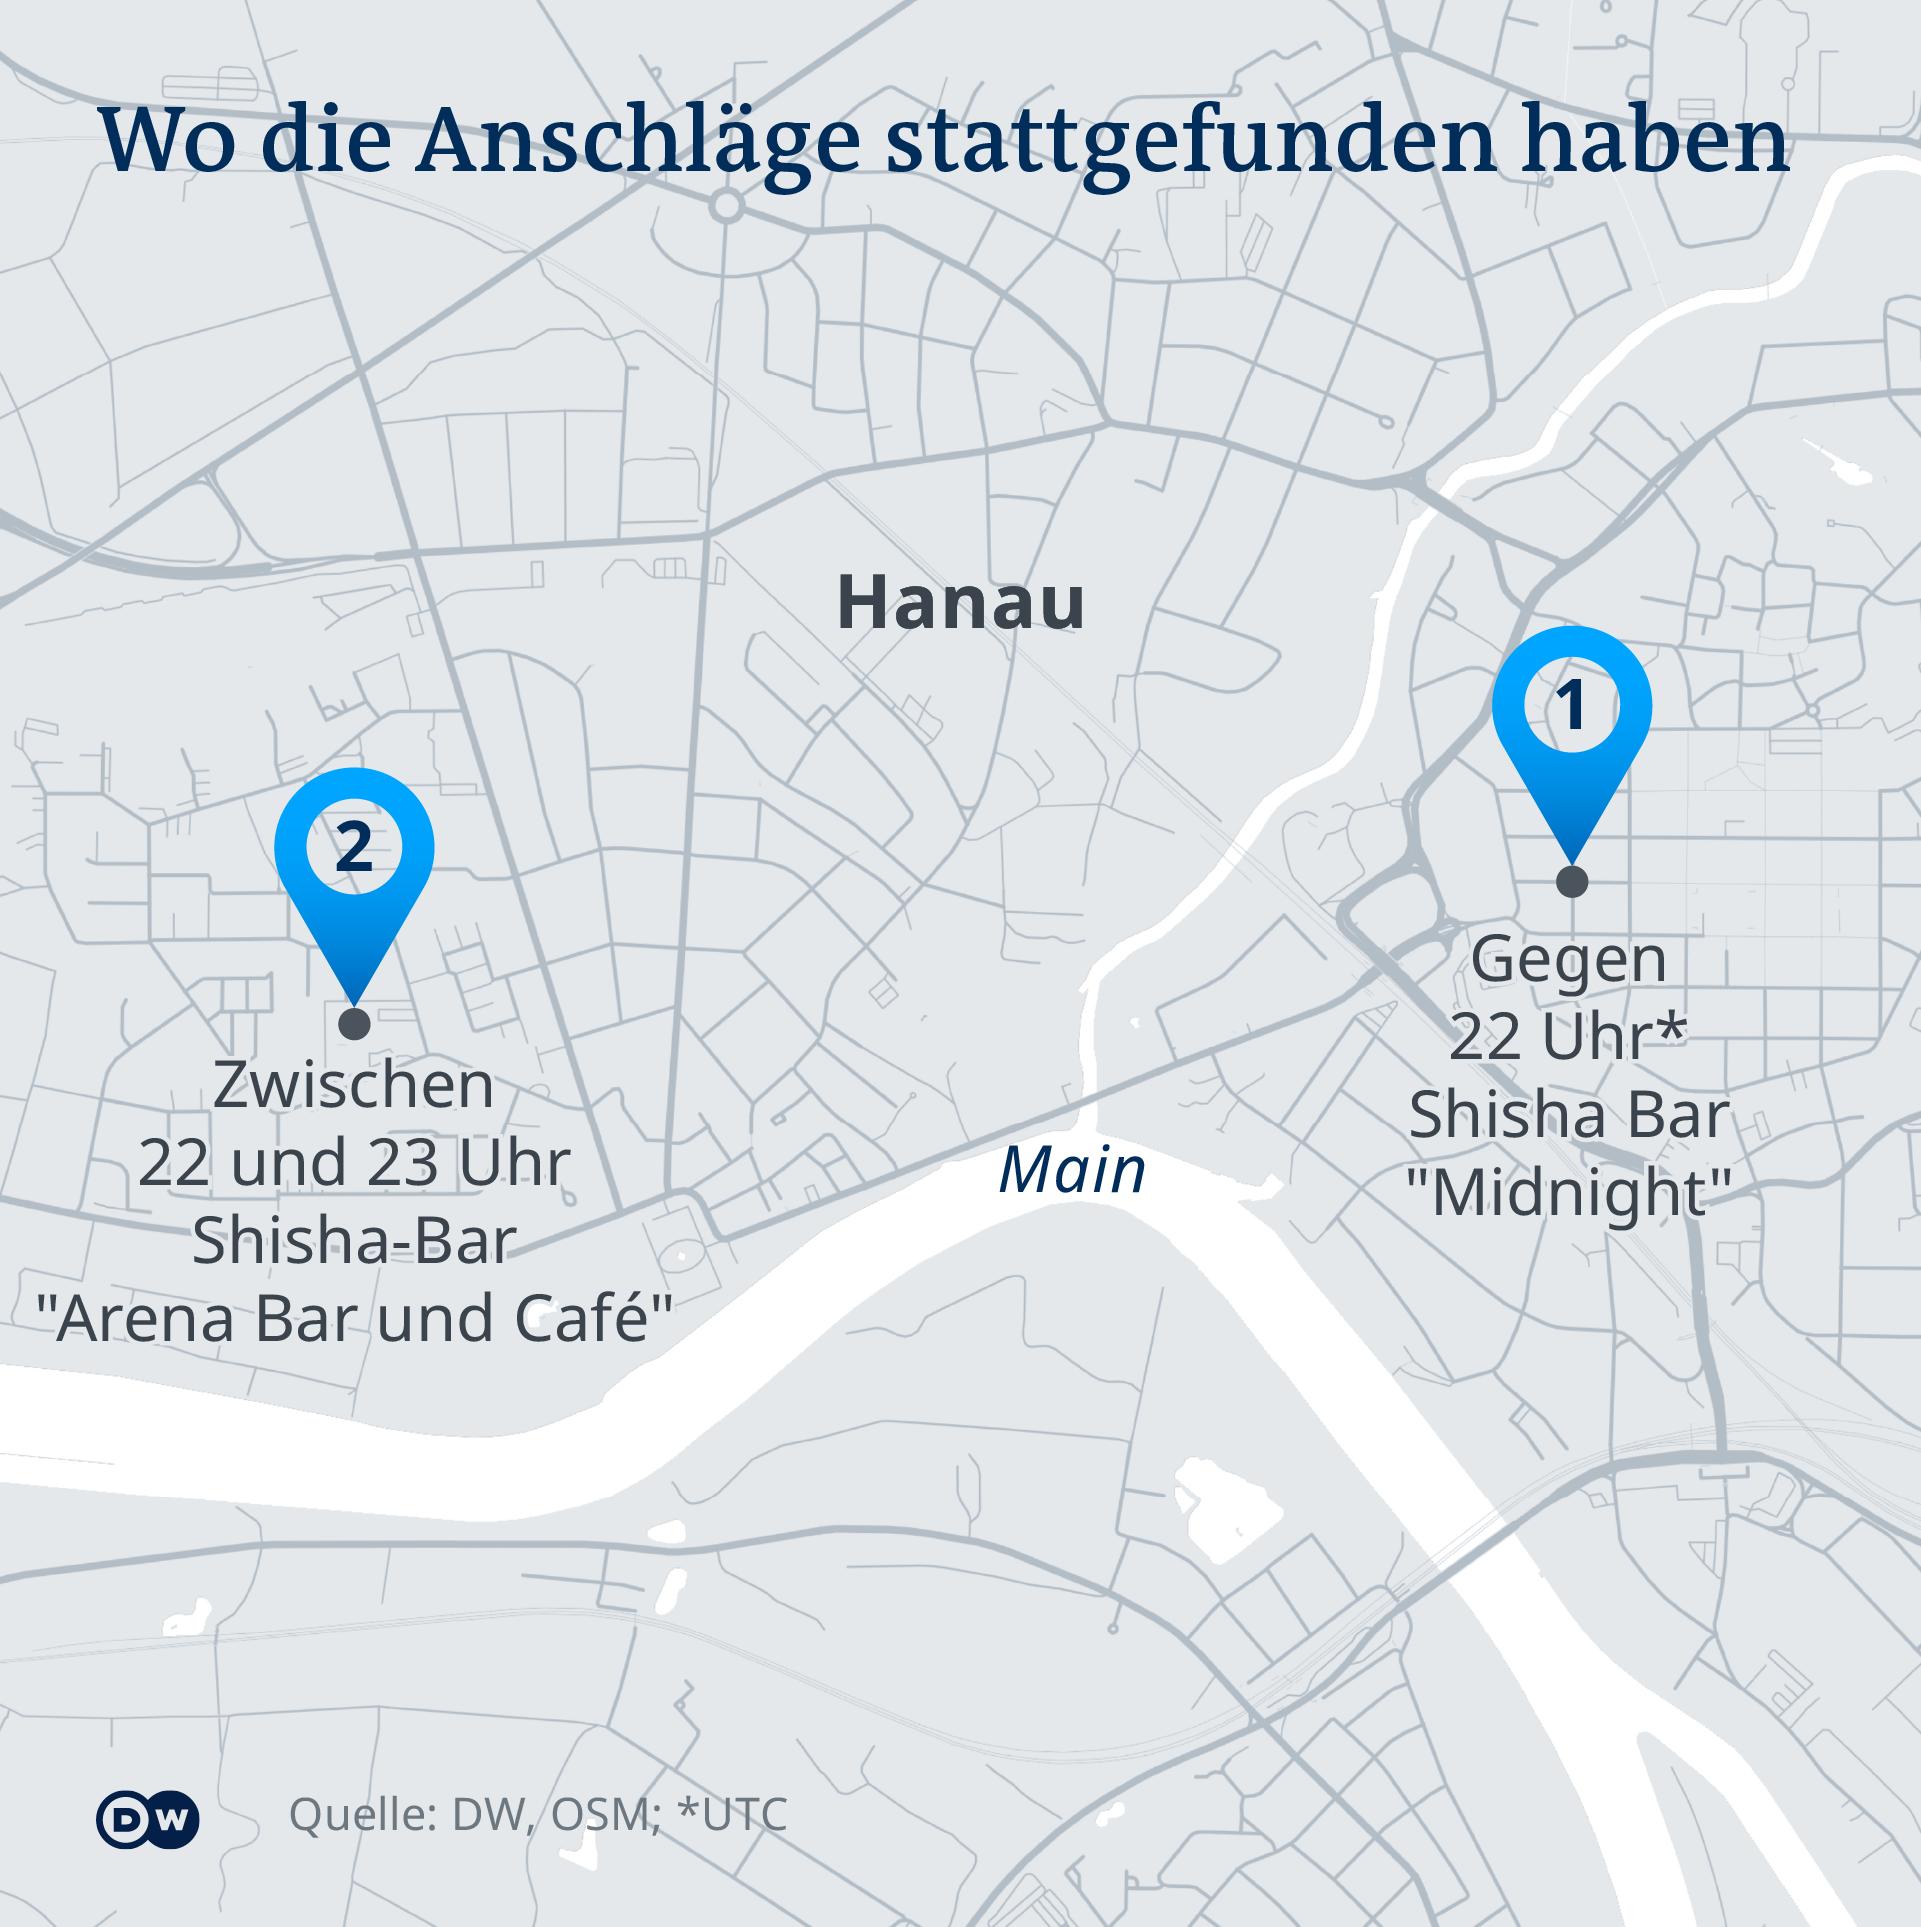 Infografik - Detailkarte der Anschlagsziele in Hanau - DE